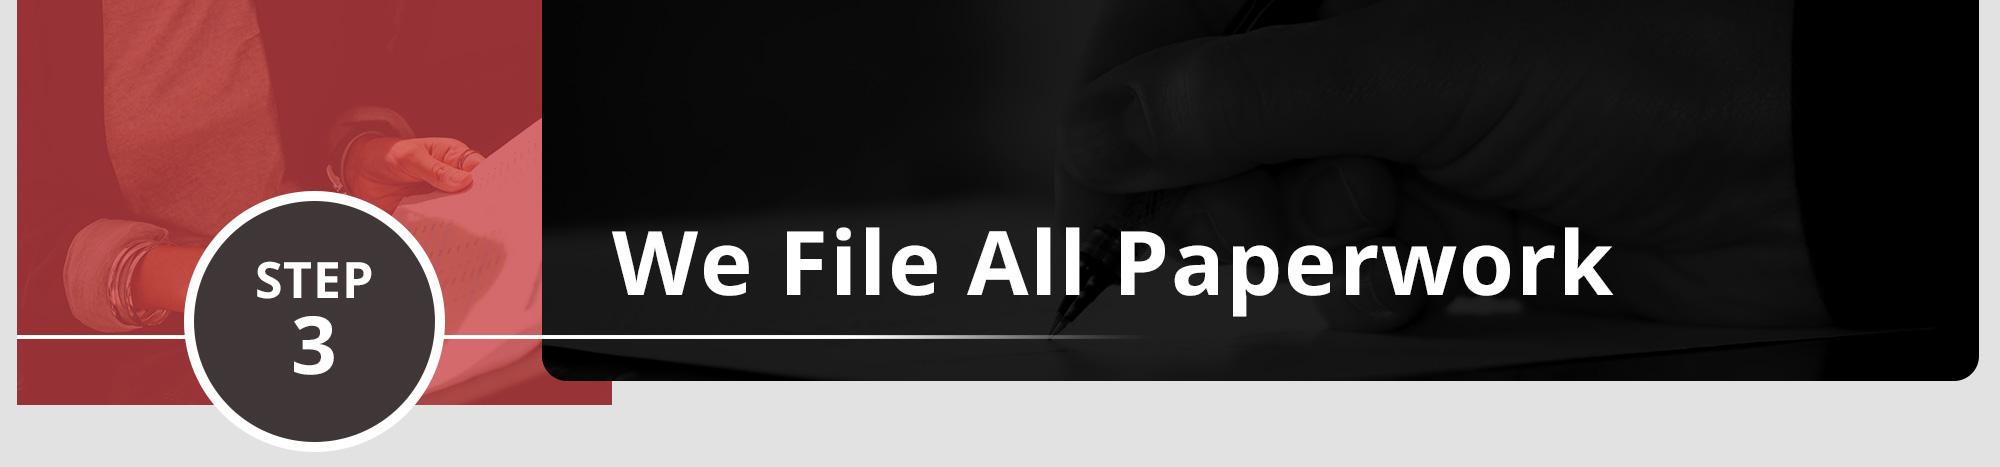 We File All Paperwork